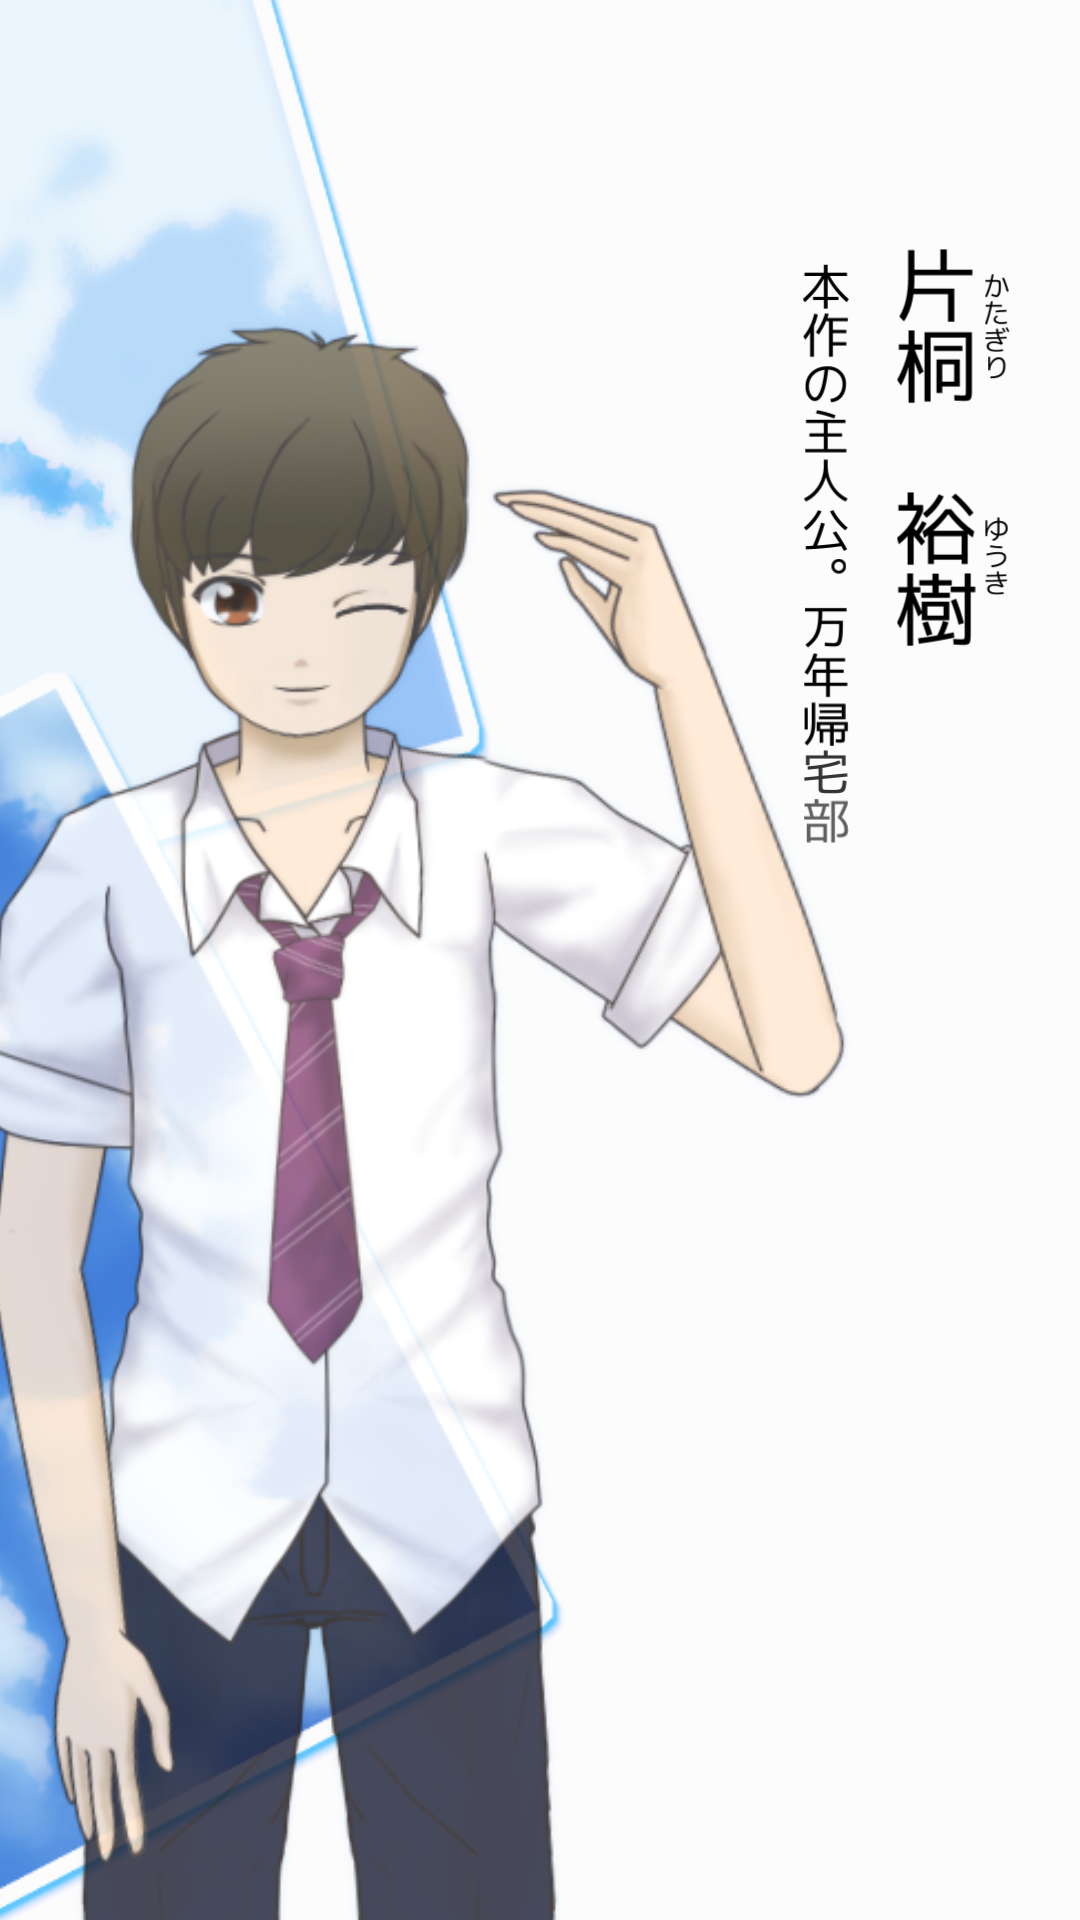 androidアプリ 夏恋 karen 〝好き〟から始まる物語攻略スクリーンショット3